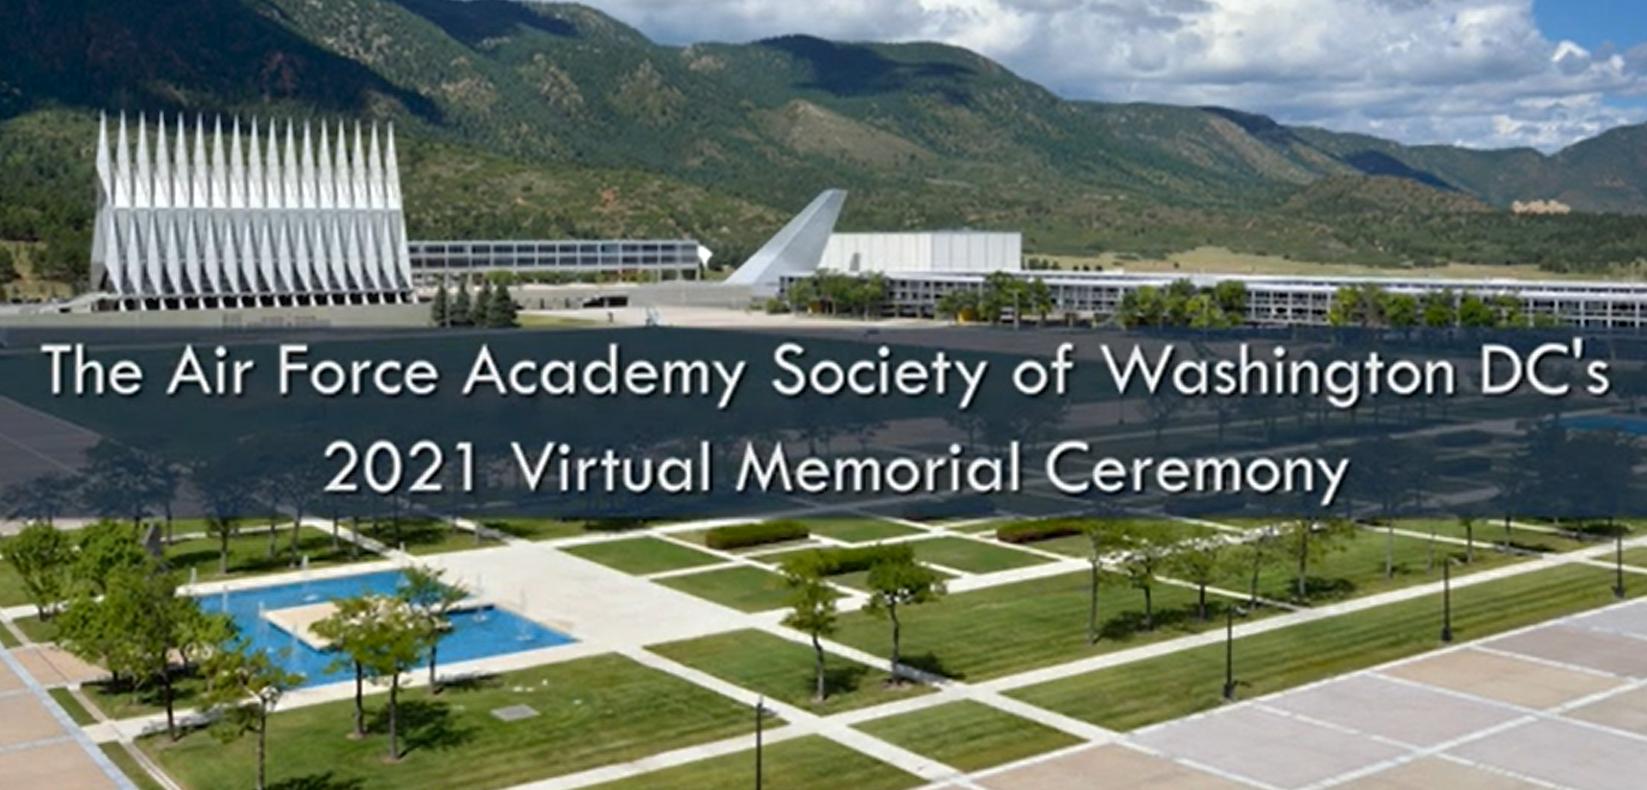 Image for Air Force Academy Society of Washington DC - 2021 Virtual Memorial Ceremony webinar